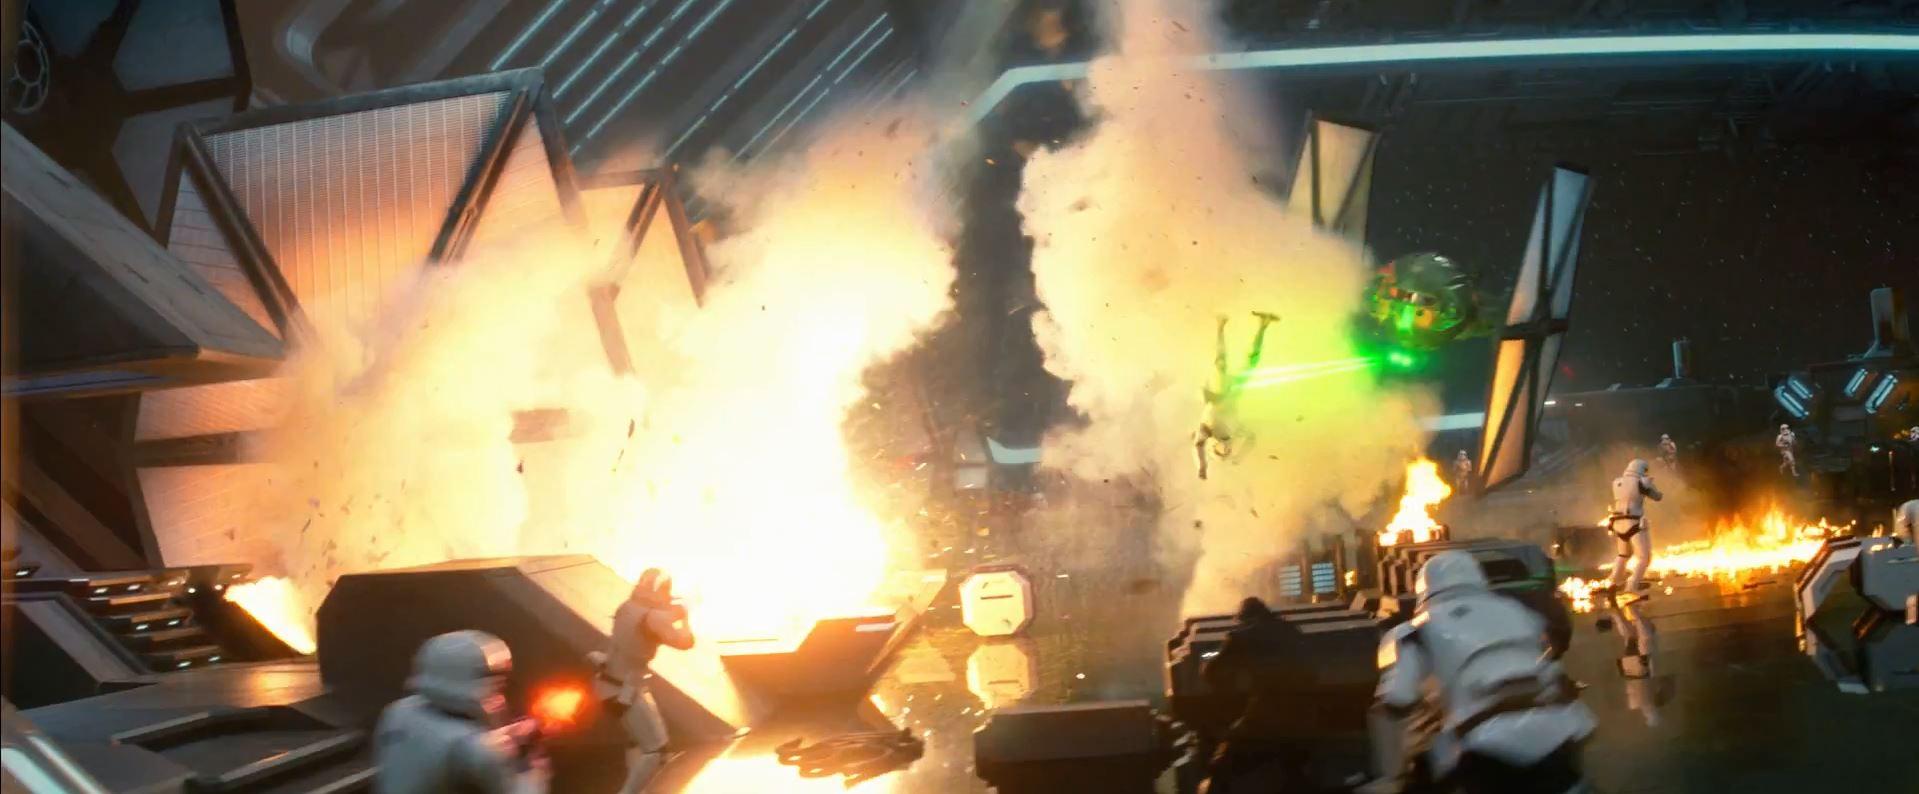 Star Destroyer hangar explosion. New Star Wars The Force Awakens Trailer Released!